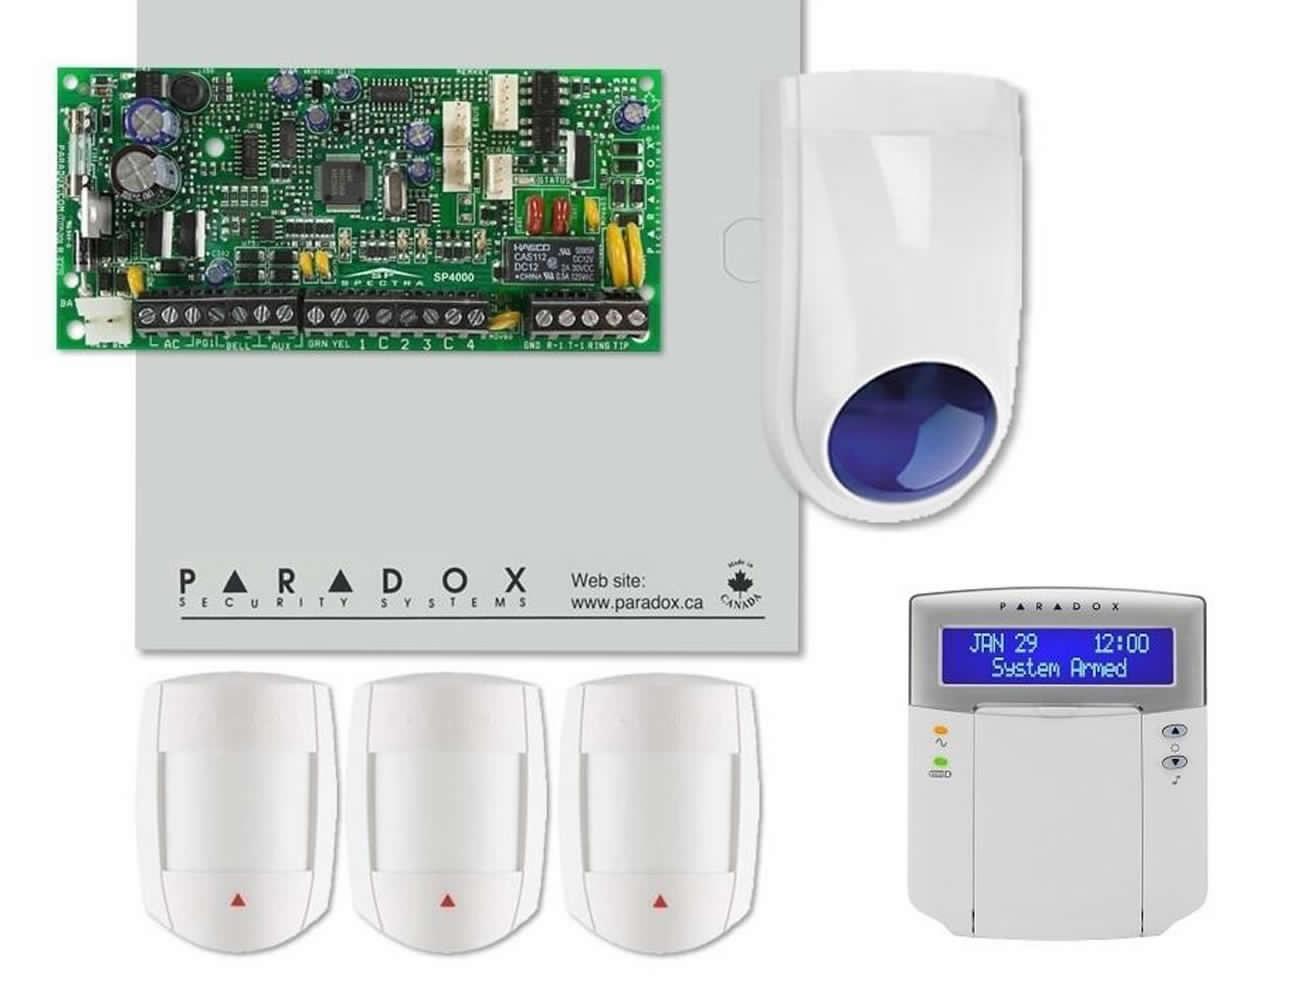 Home Security Systems Perth | Security Alarms | CCTV Cameras